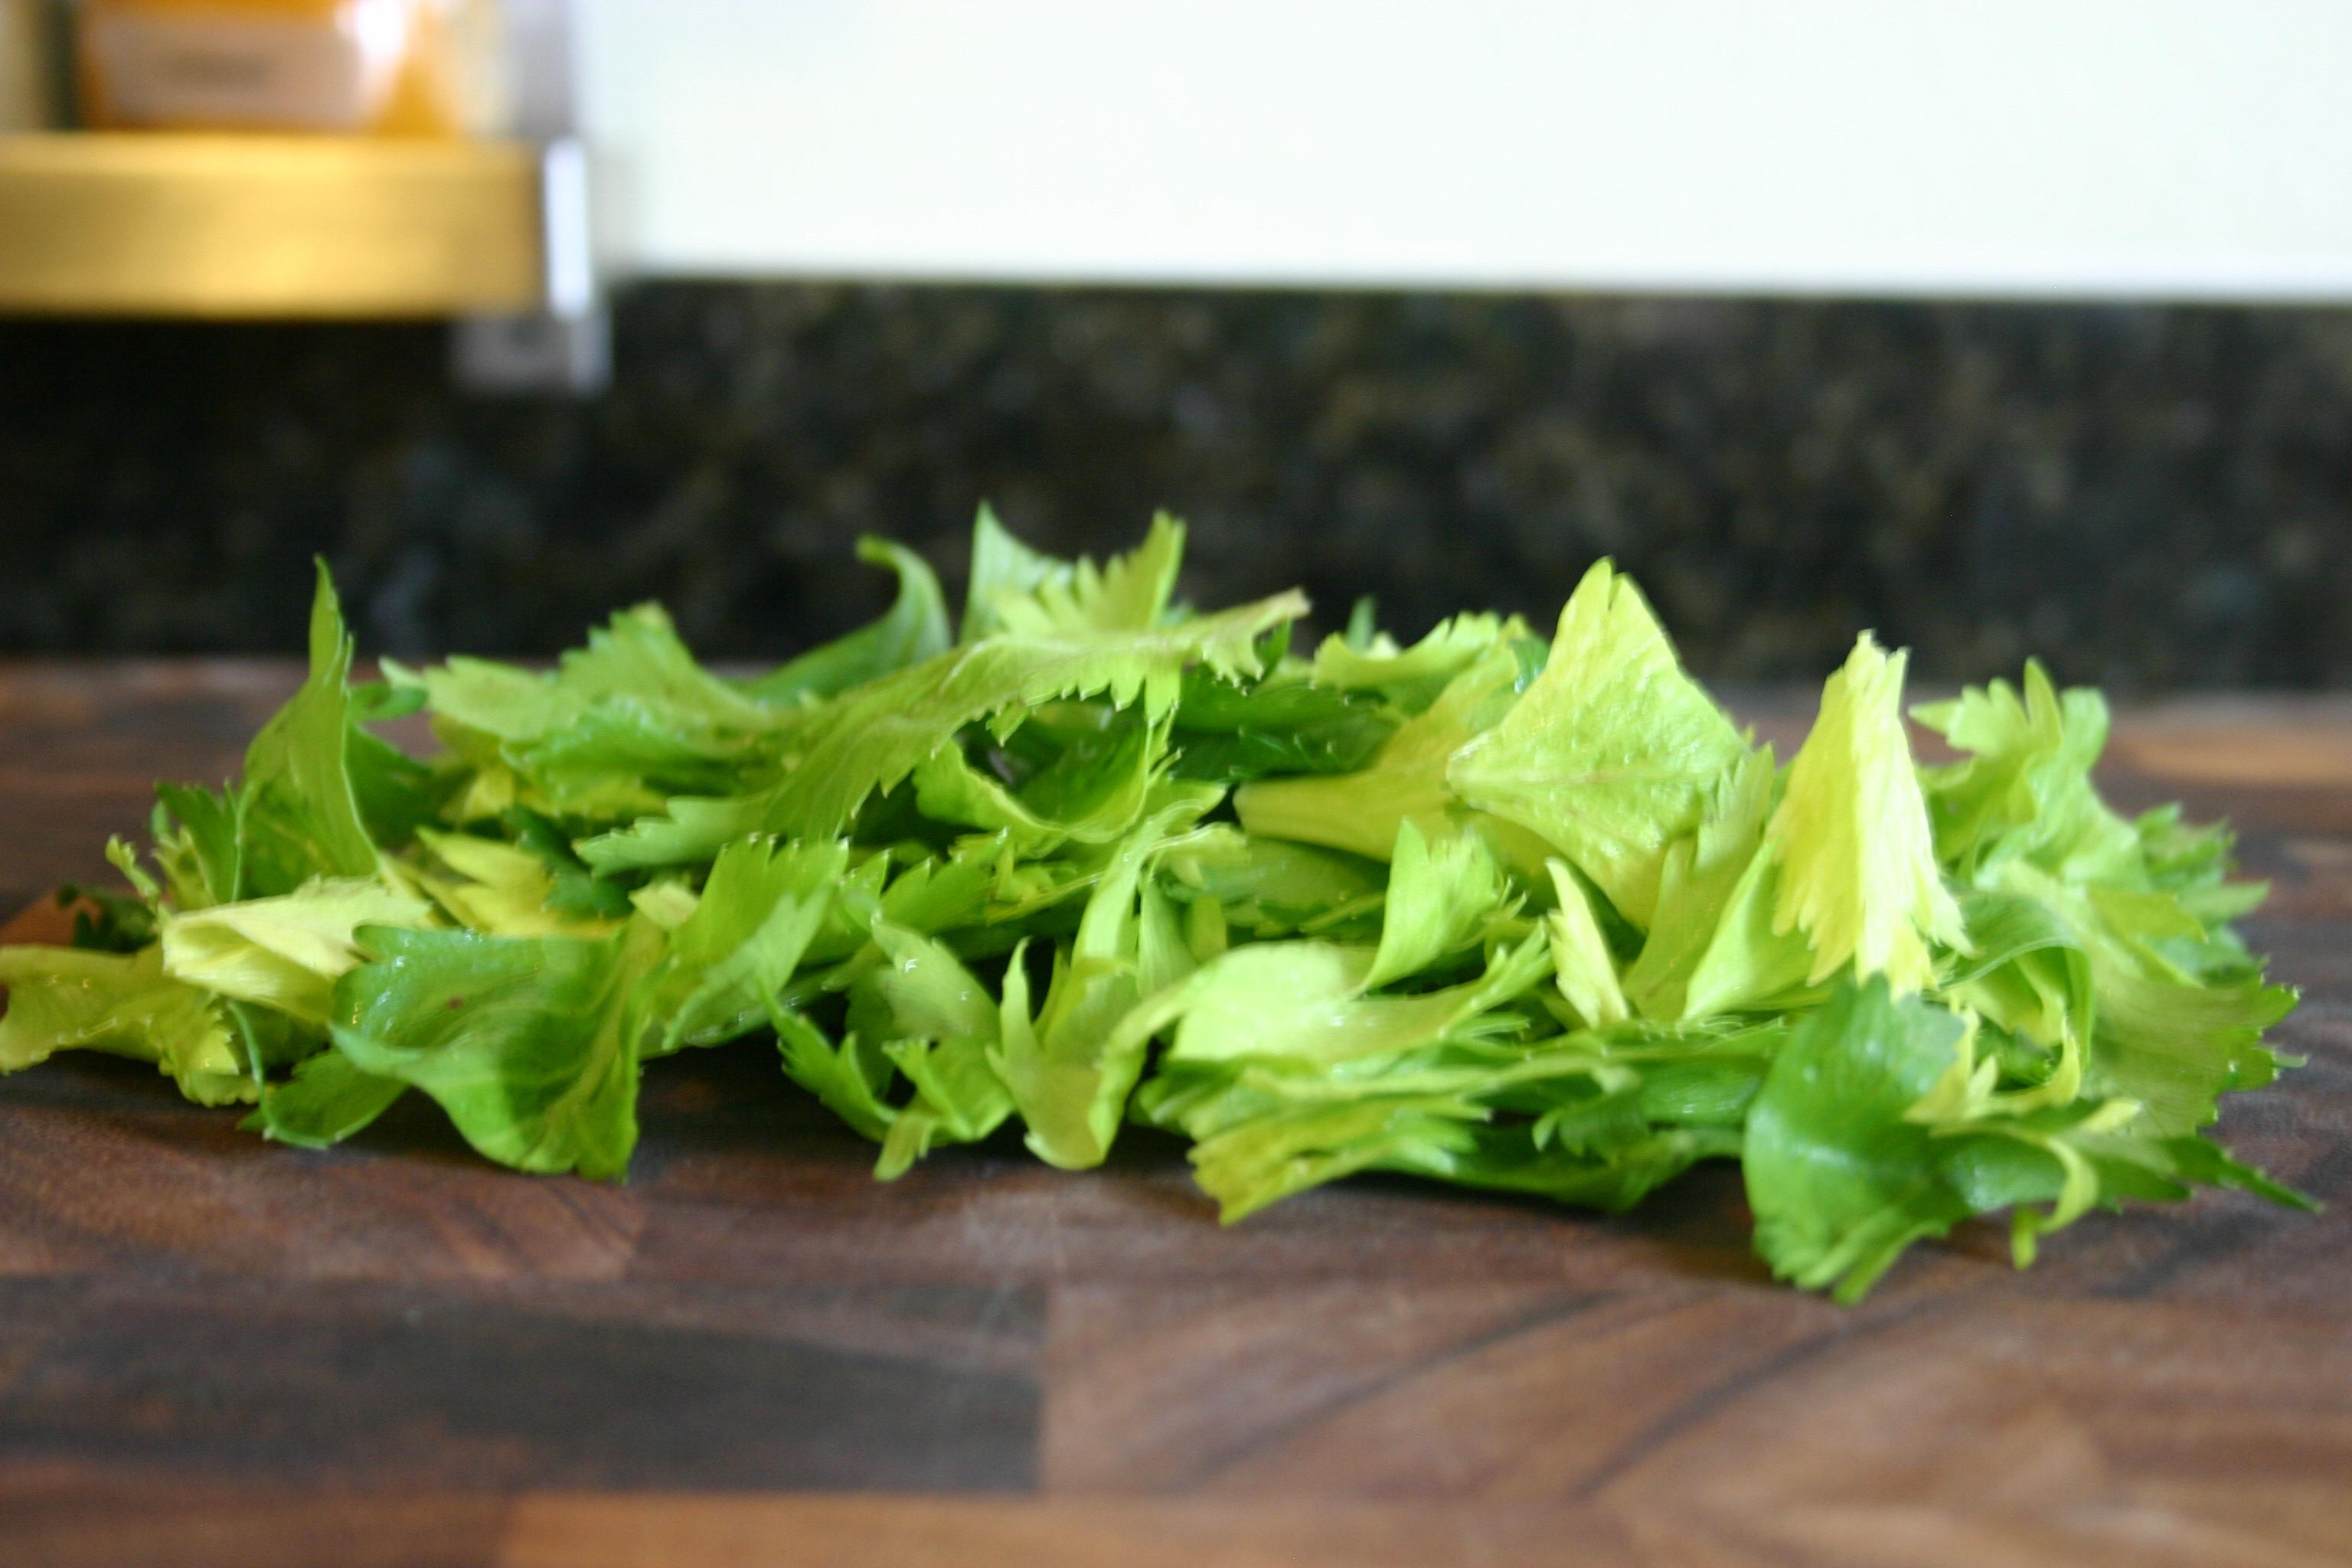 Homemade Celery Salt | All Things Simple